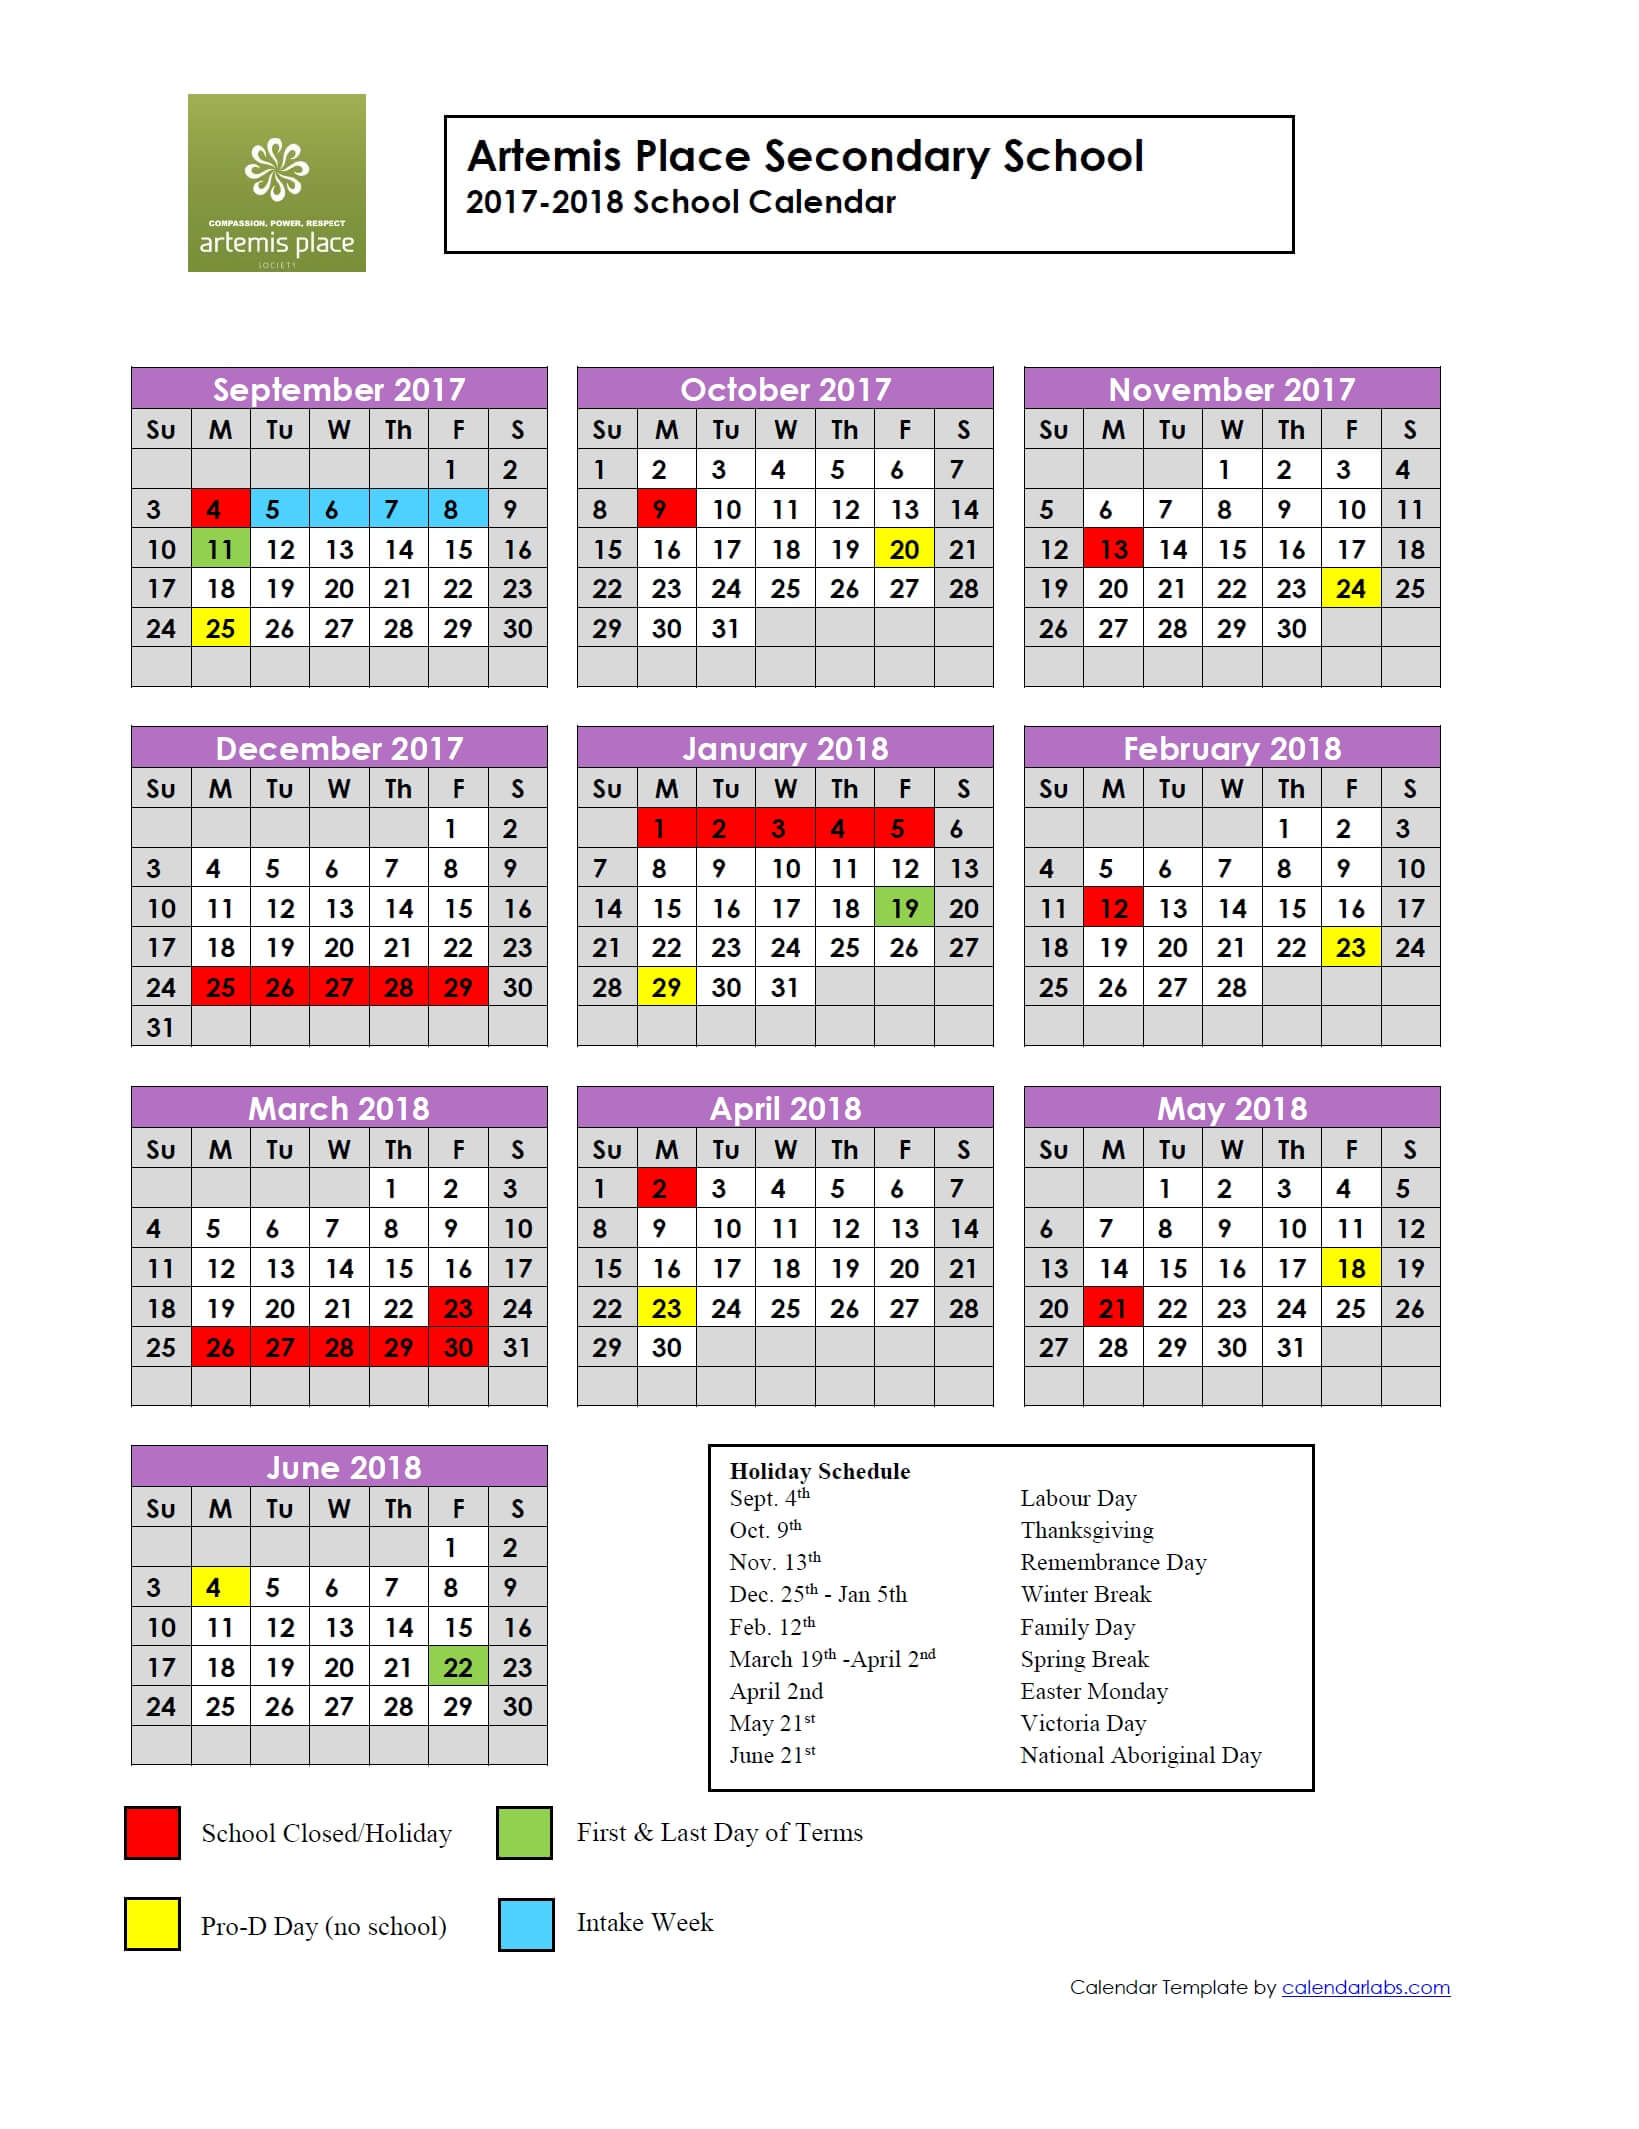 2017 2018 year at glance calendar artemis place